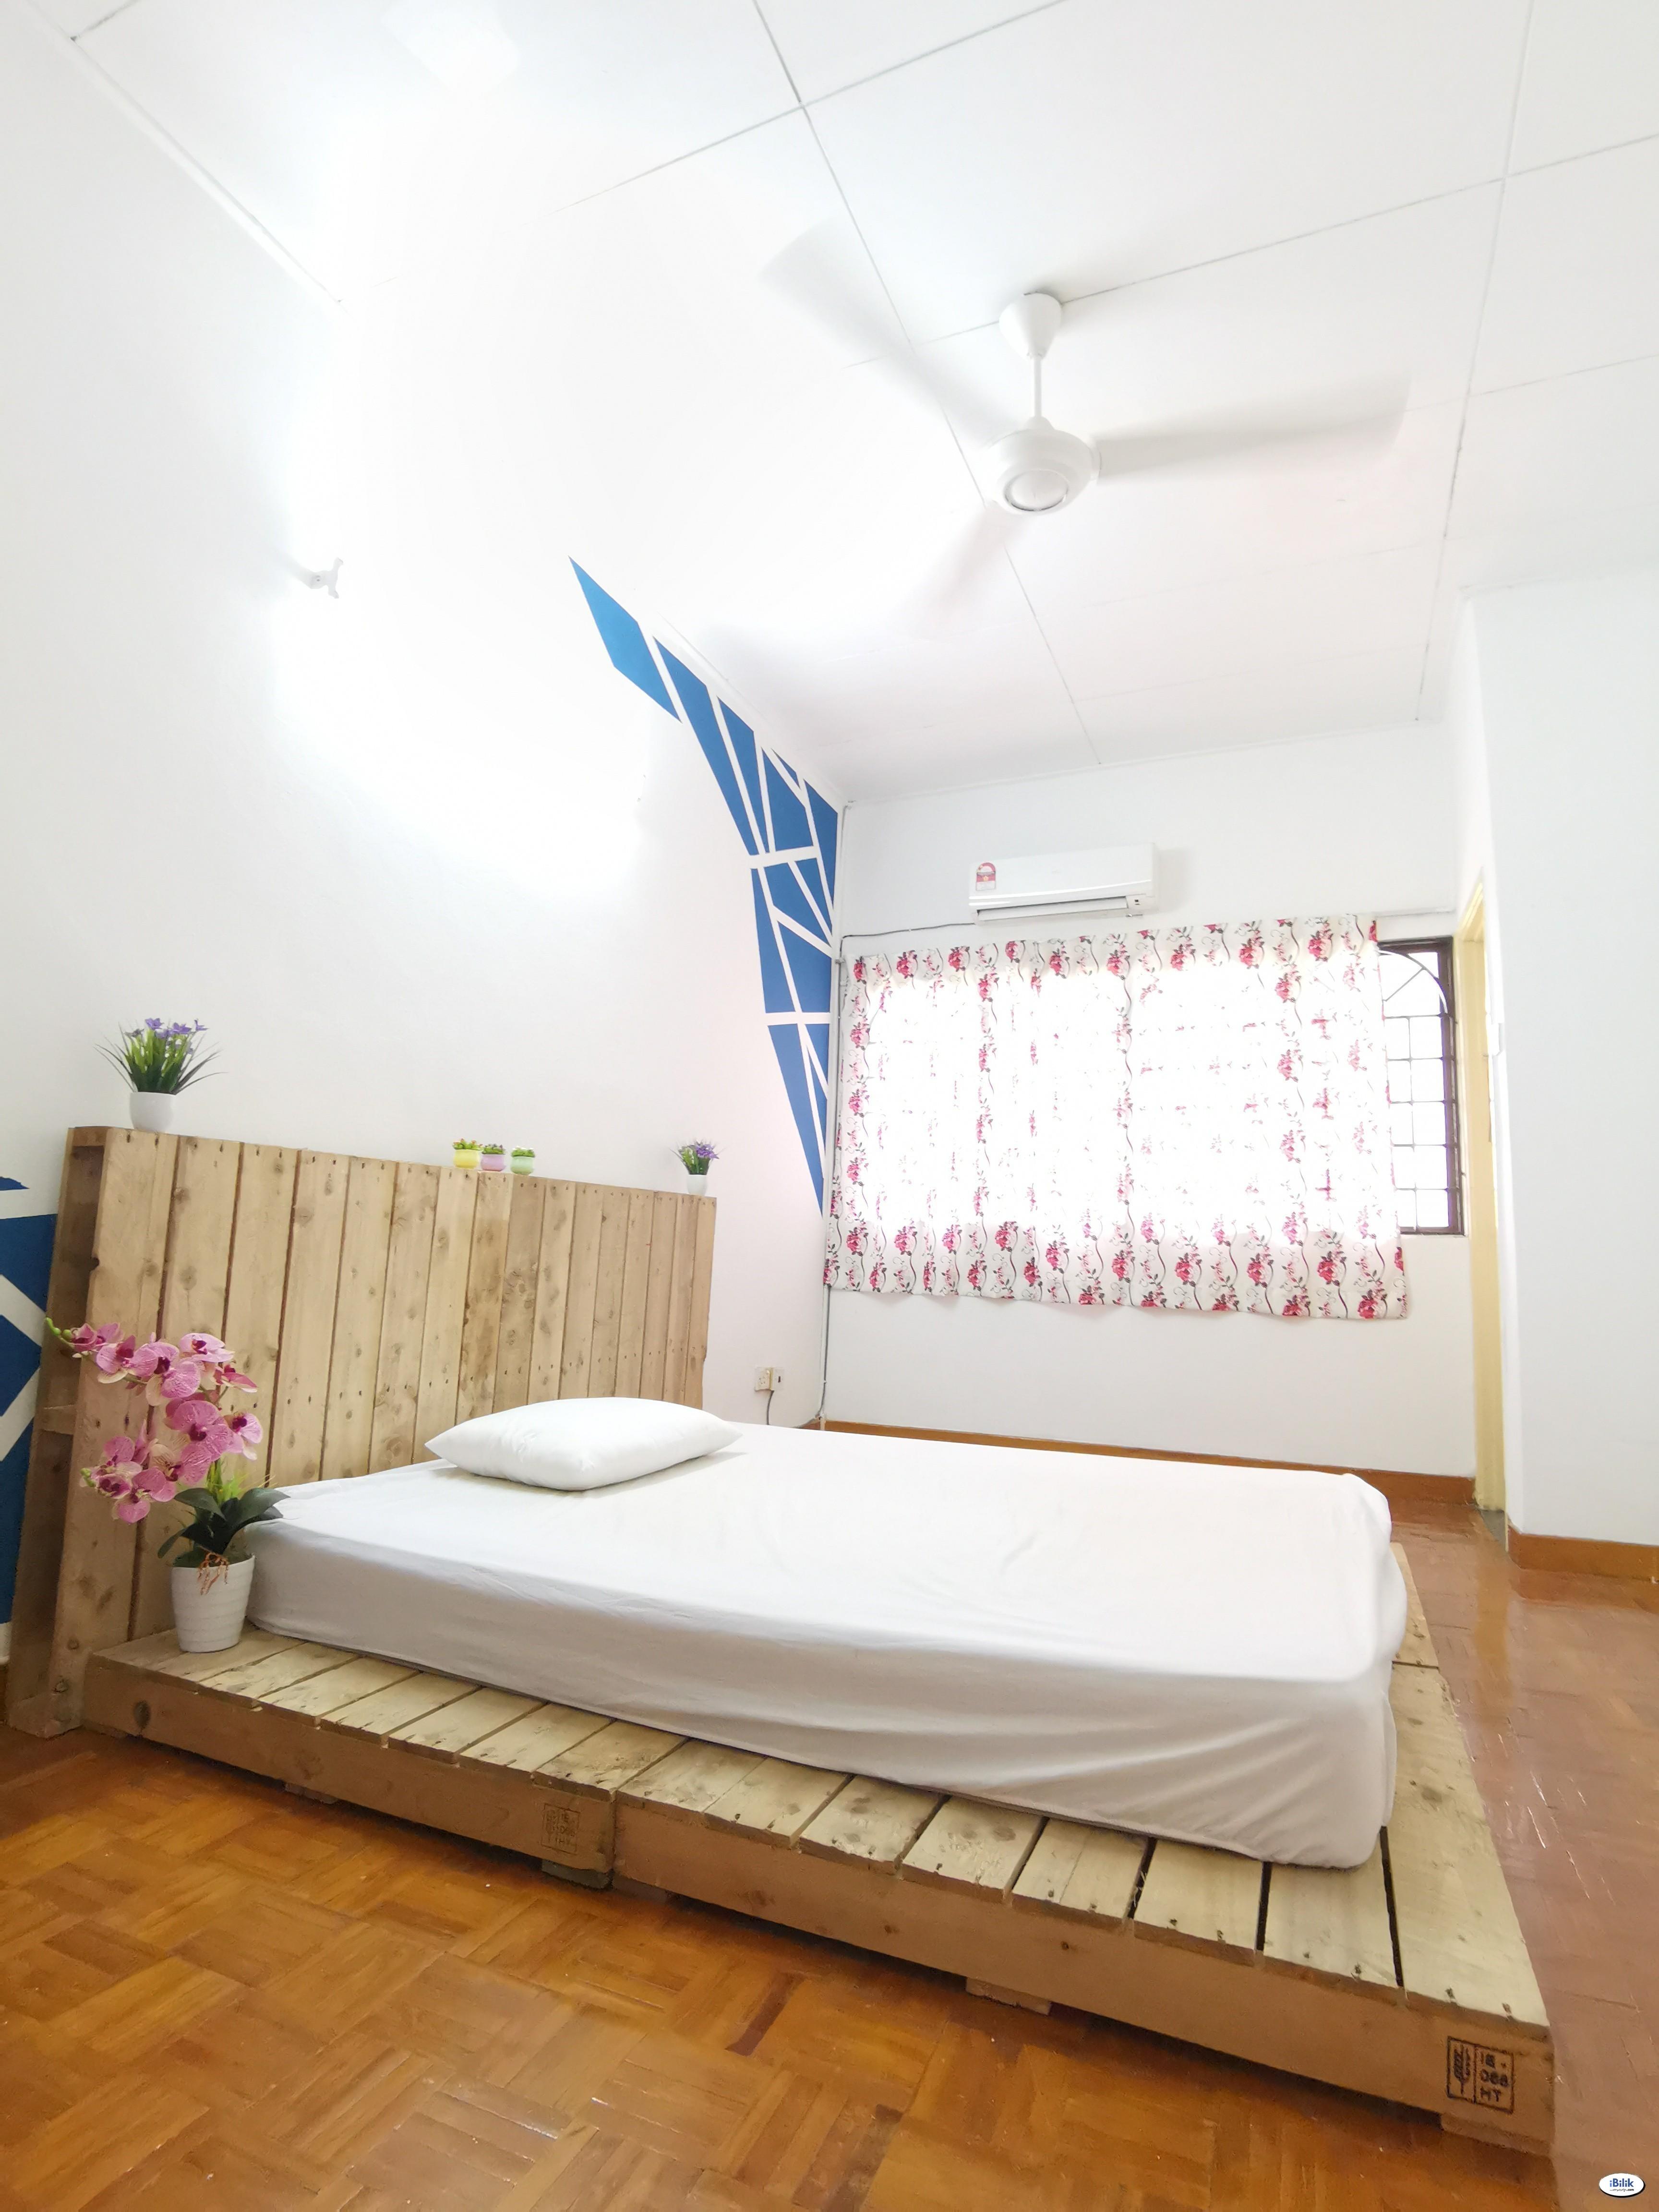 ⚡Attached  Master Room at BU7, Bandar Utama Near Centre point Bandar Utama / One Utama Mall⚡